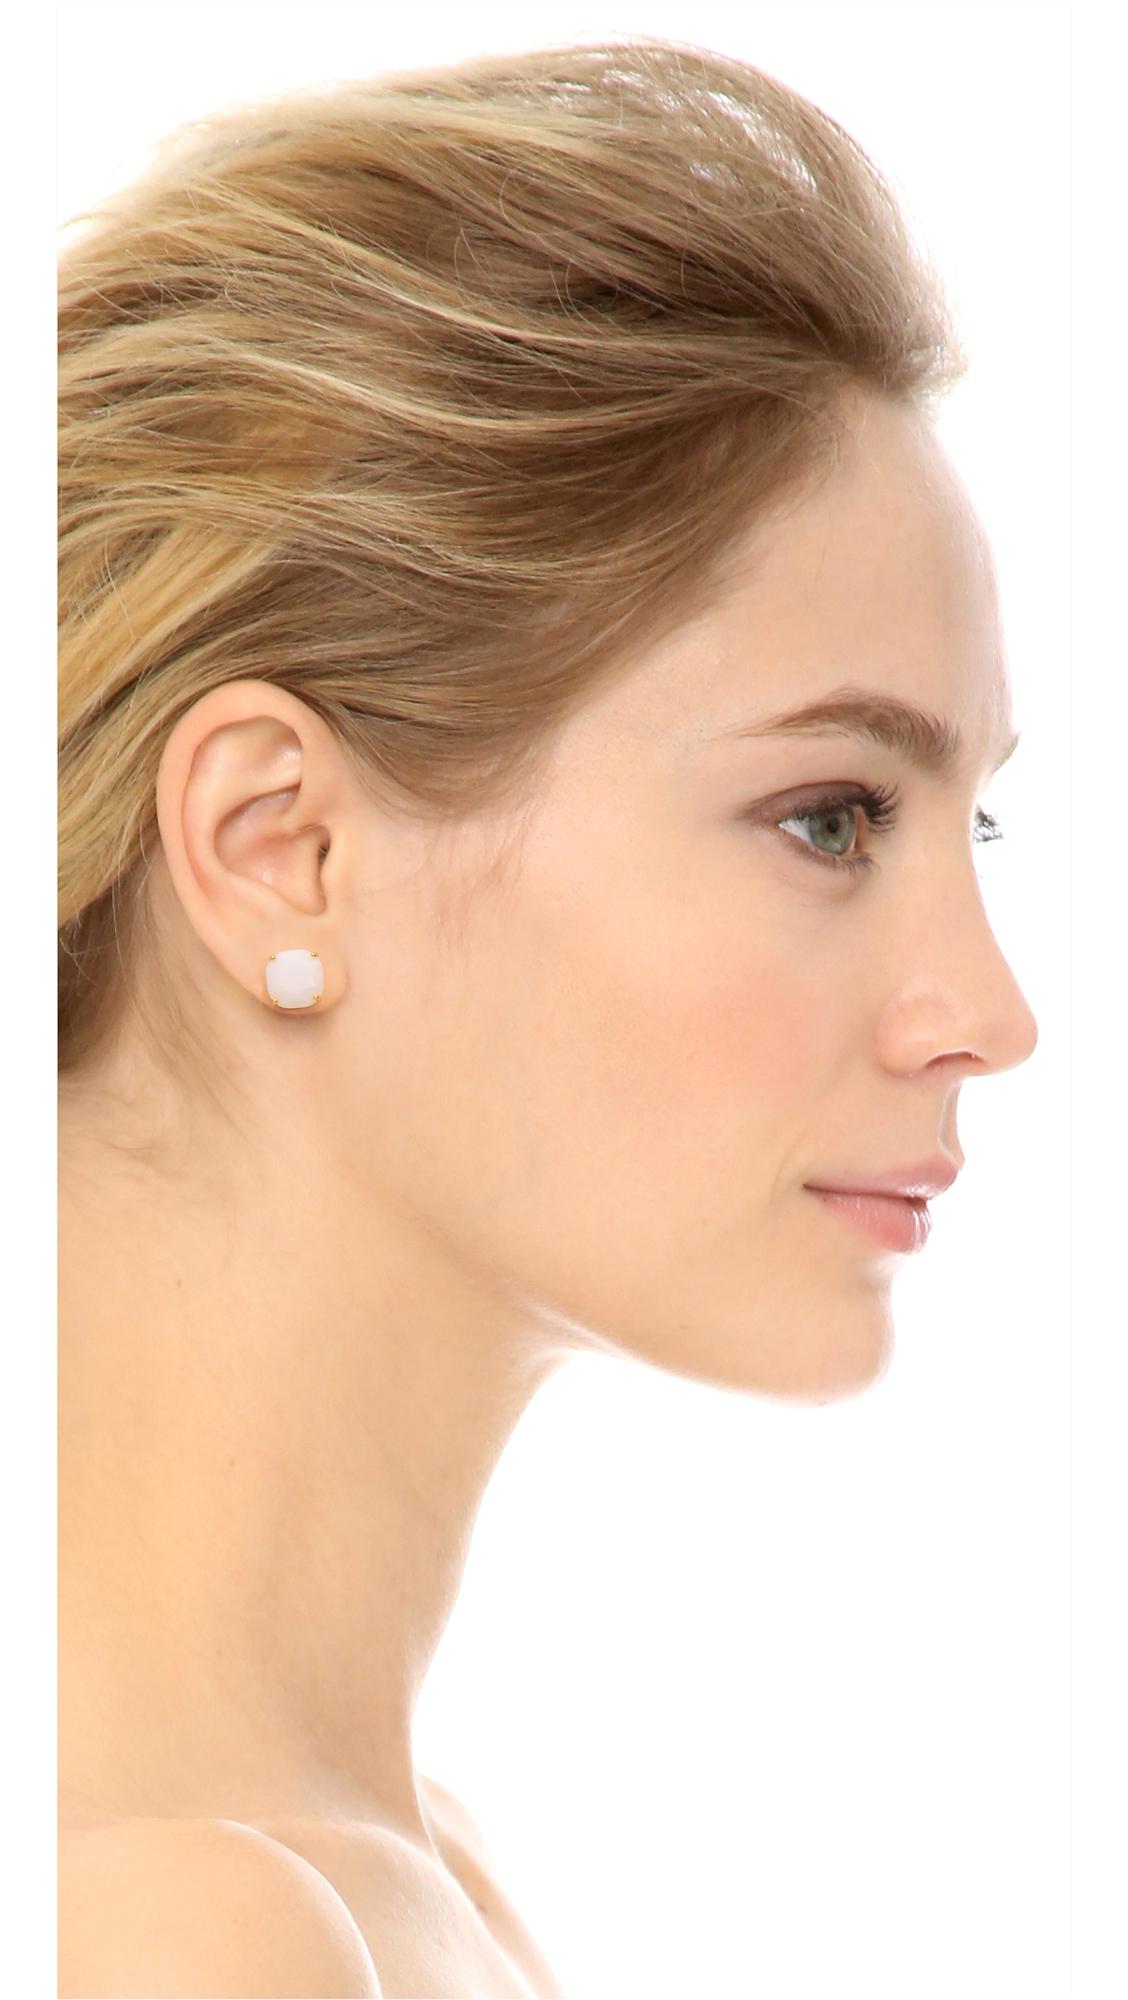 kate spade new york Small Square Stud Earrings YT7Ru